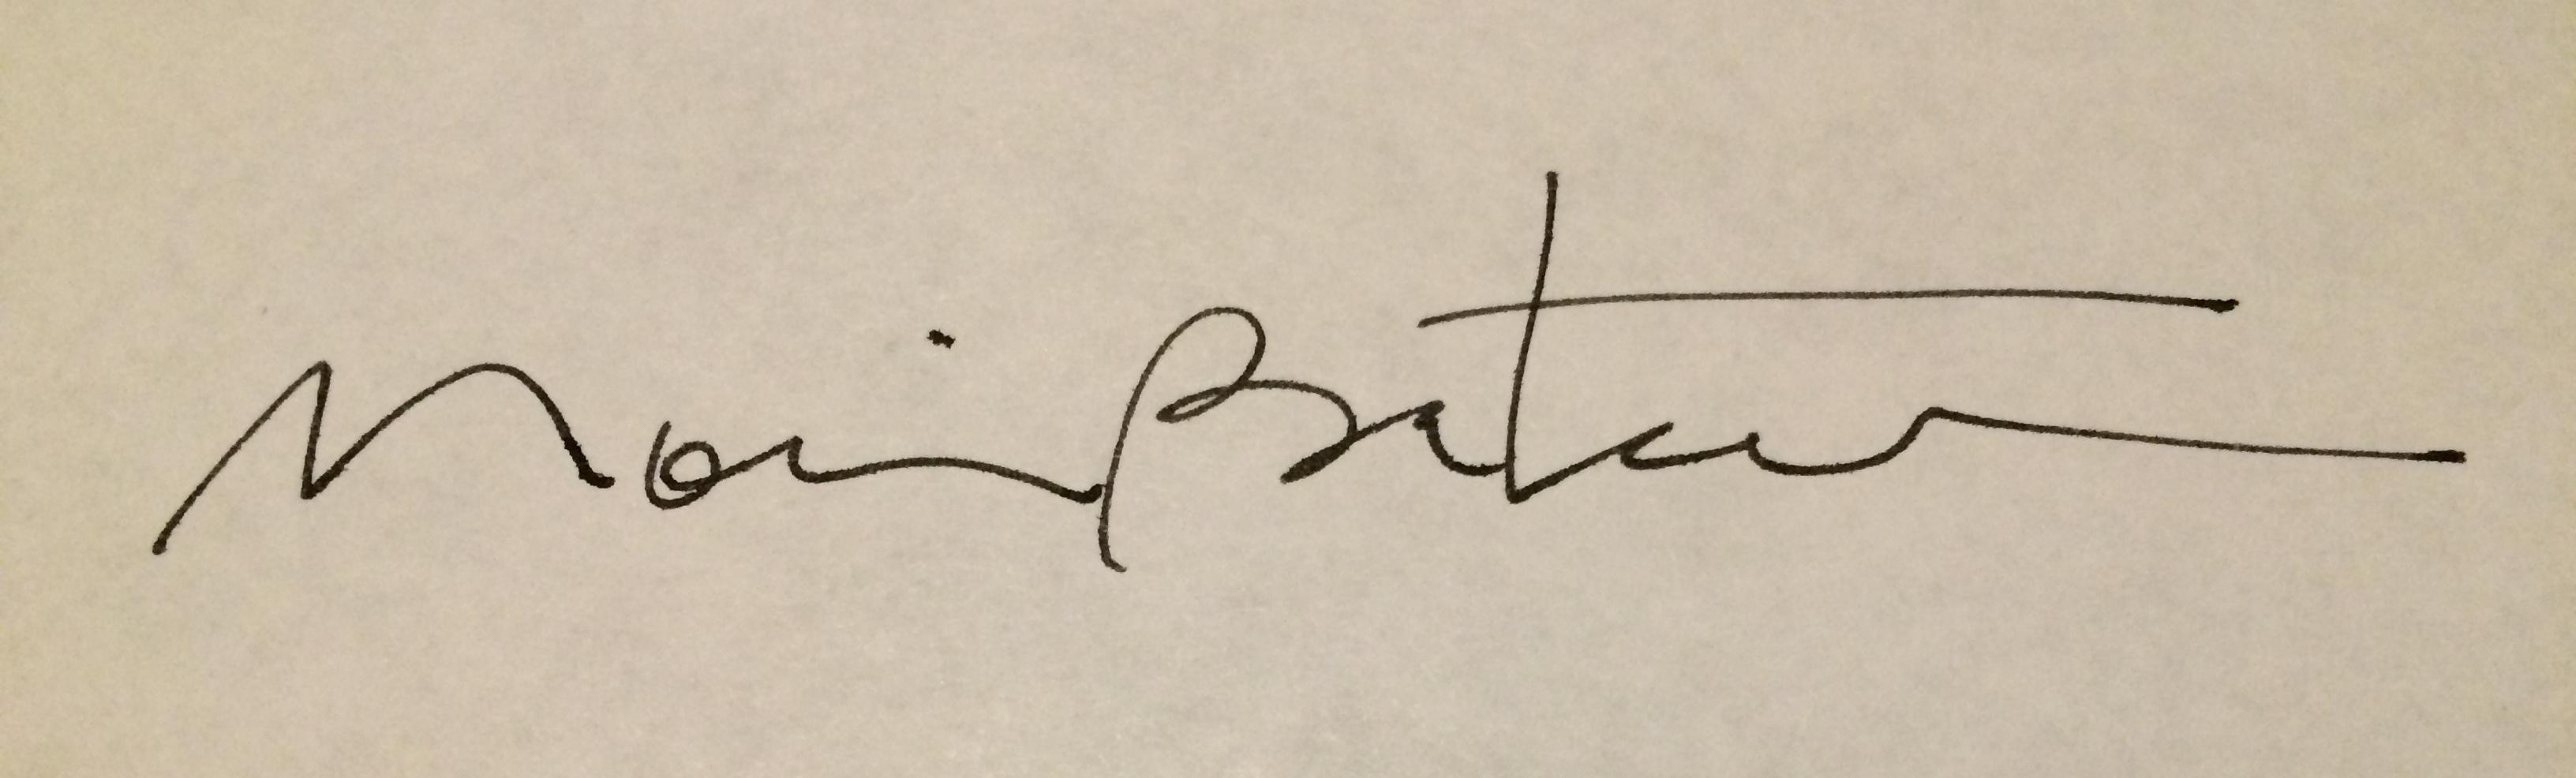 Moira Bateman's Signature